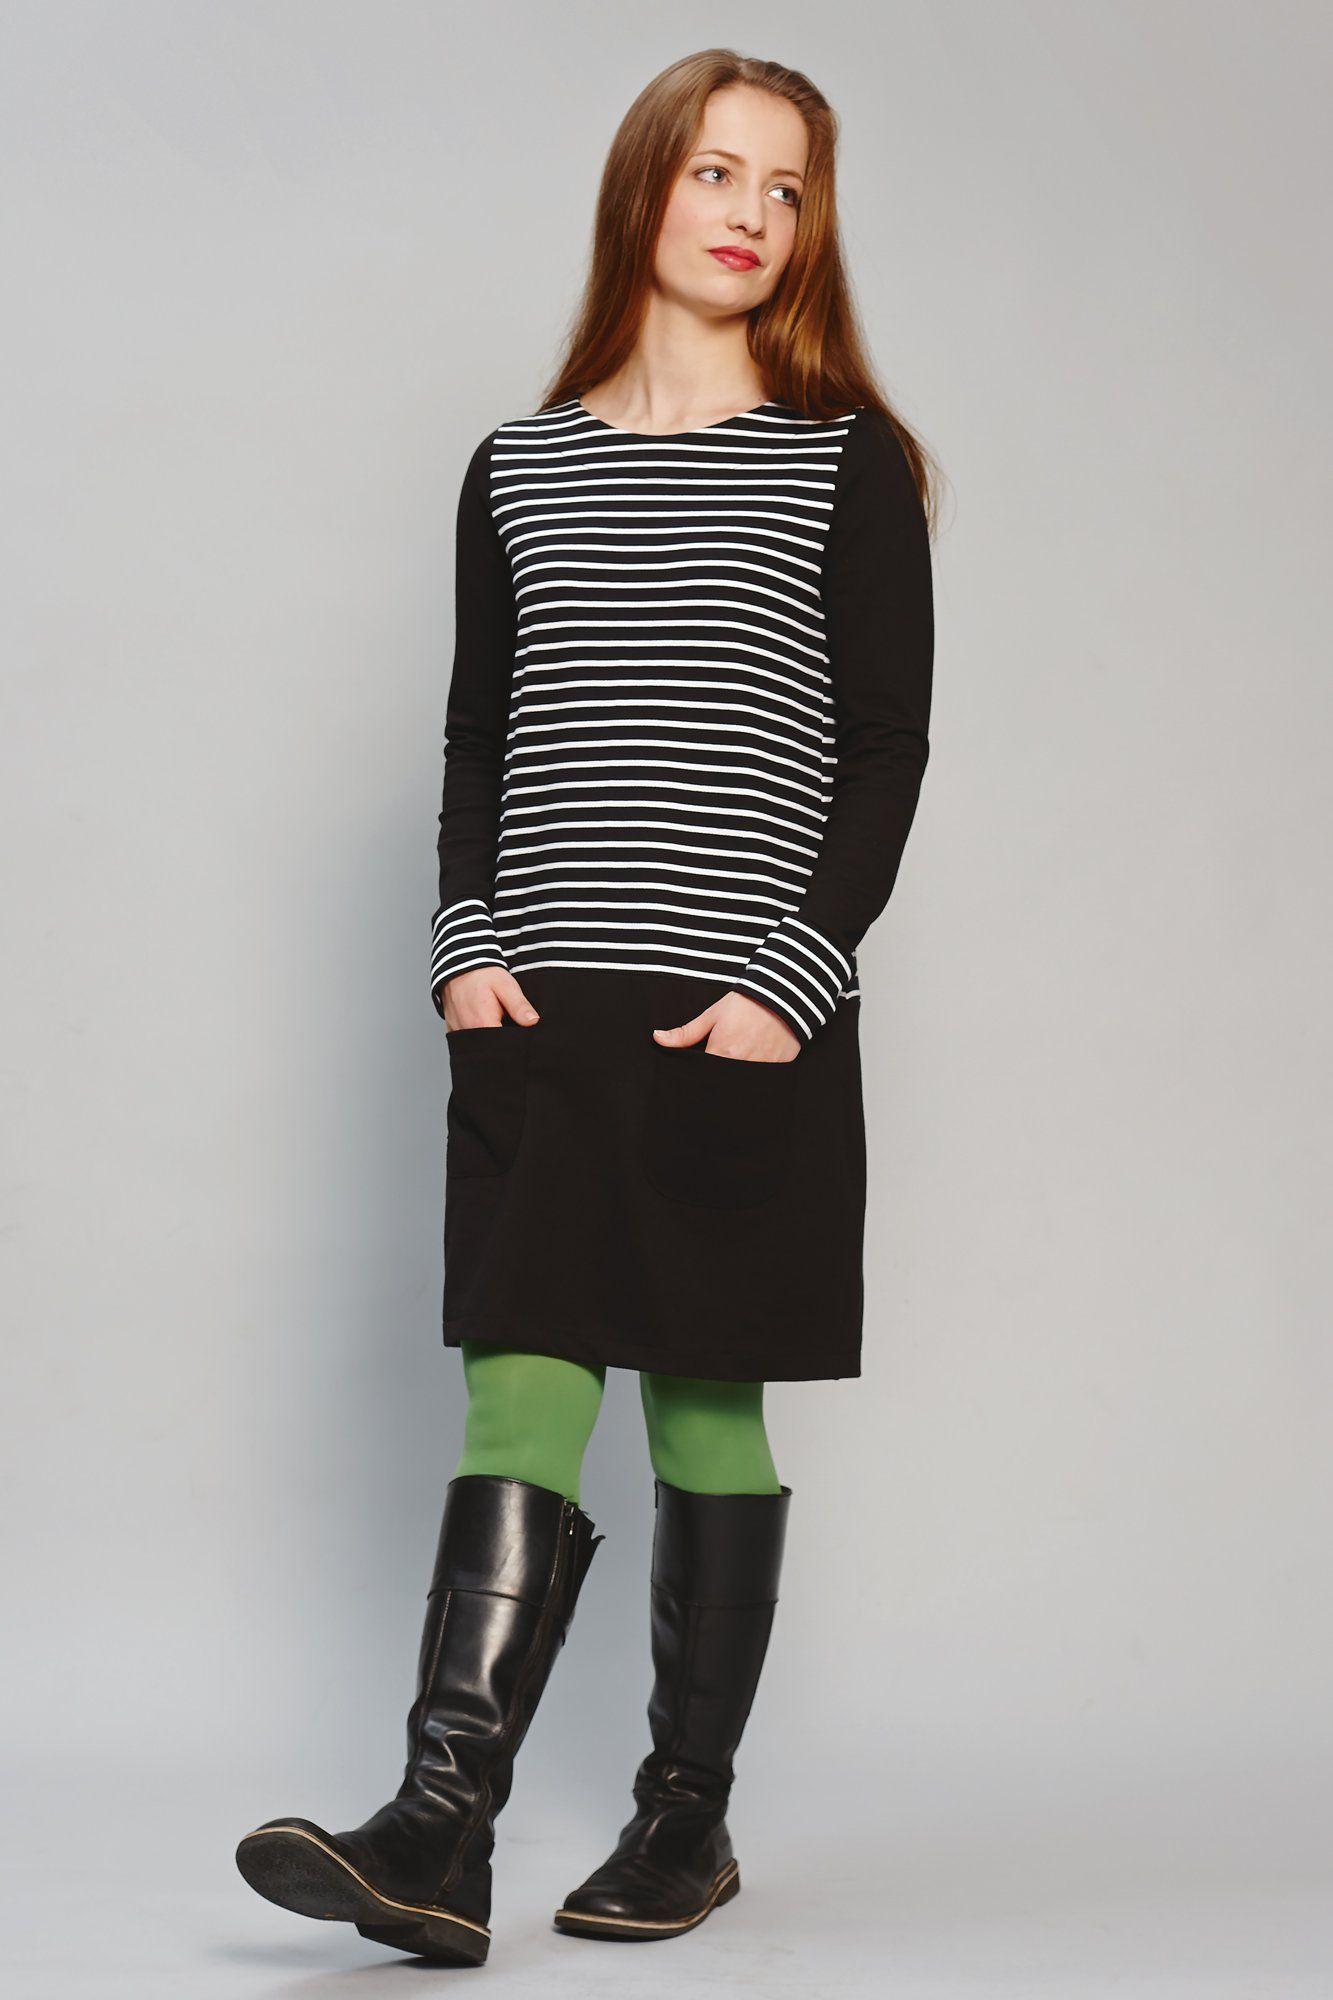 Jerseykleid nähen – Gratis-Schnittmuster und Nähanleitung